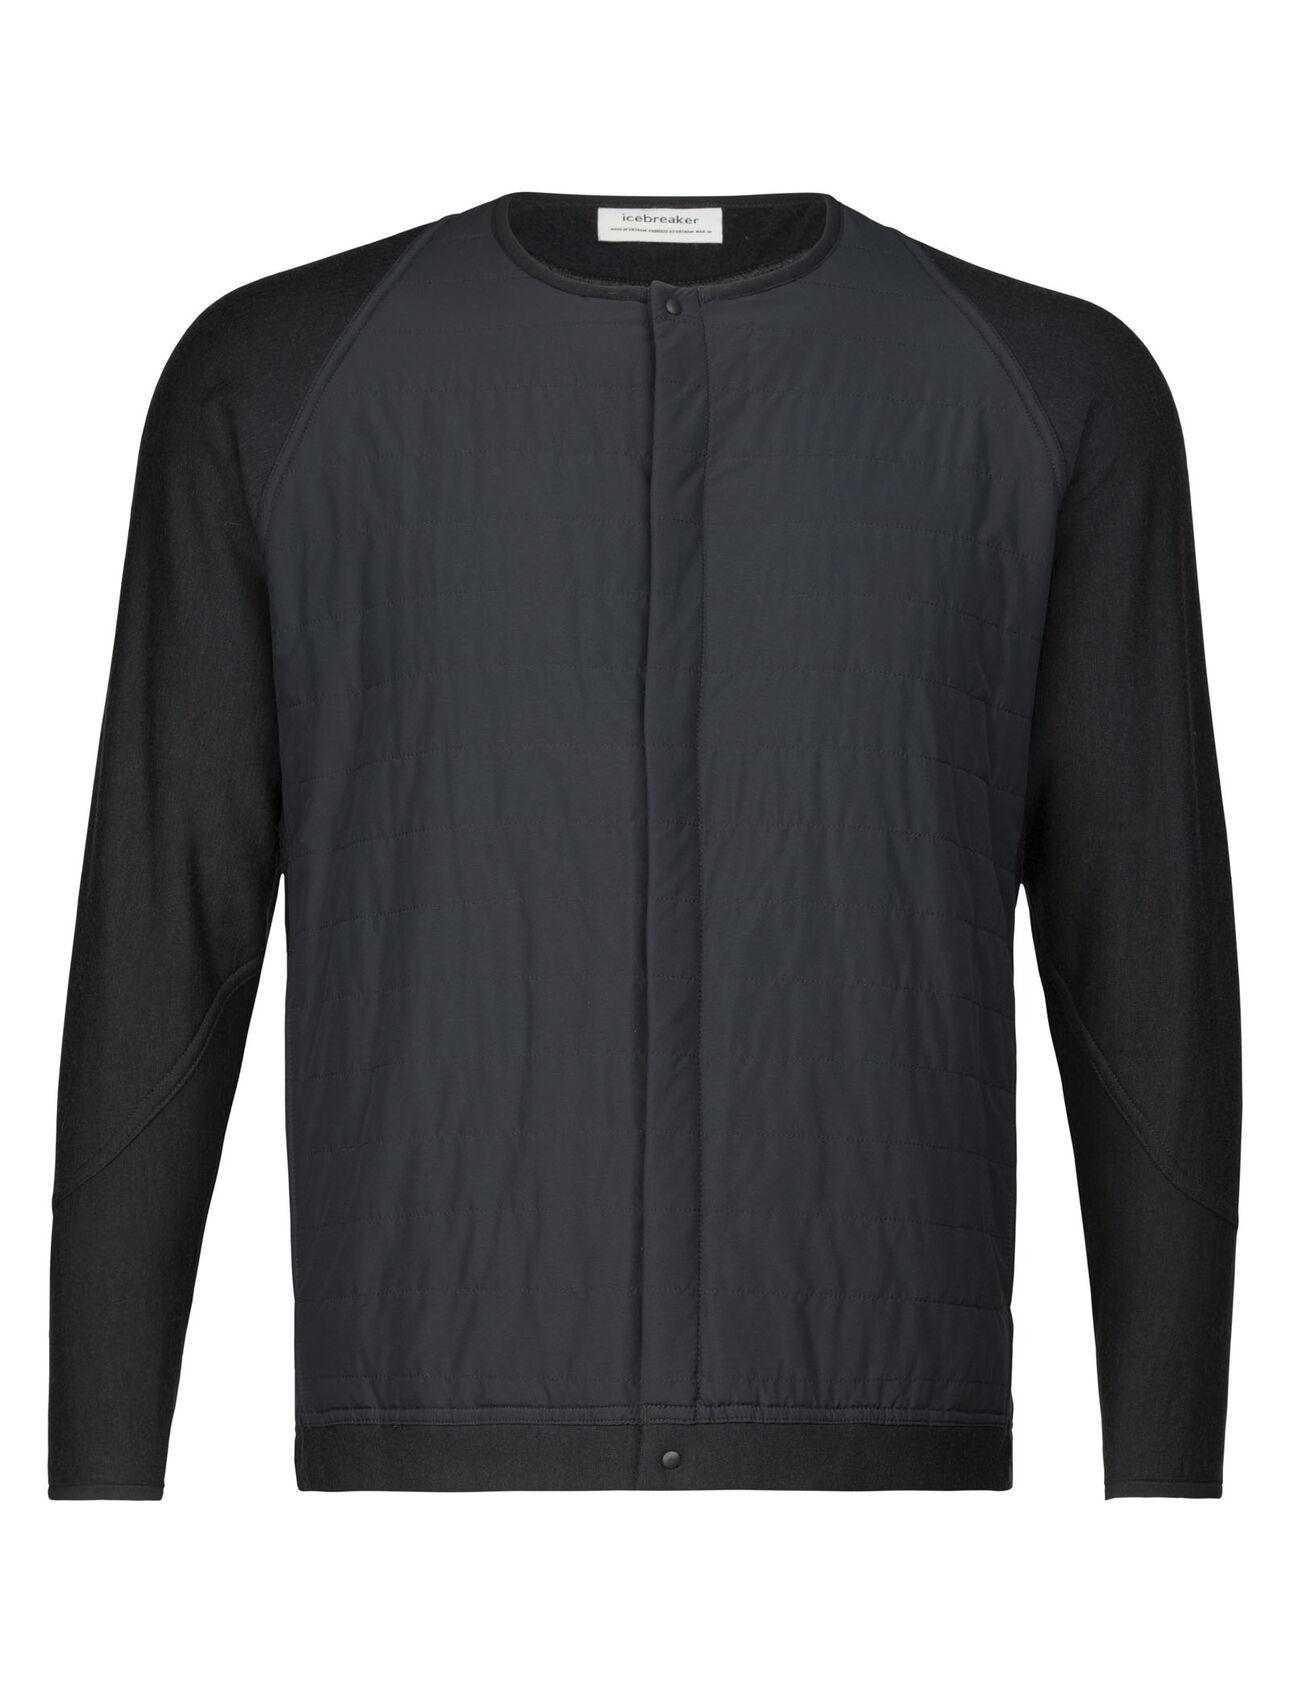 RealFleece® Merino Hybrid Cardigan